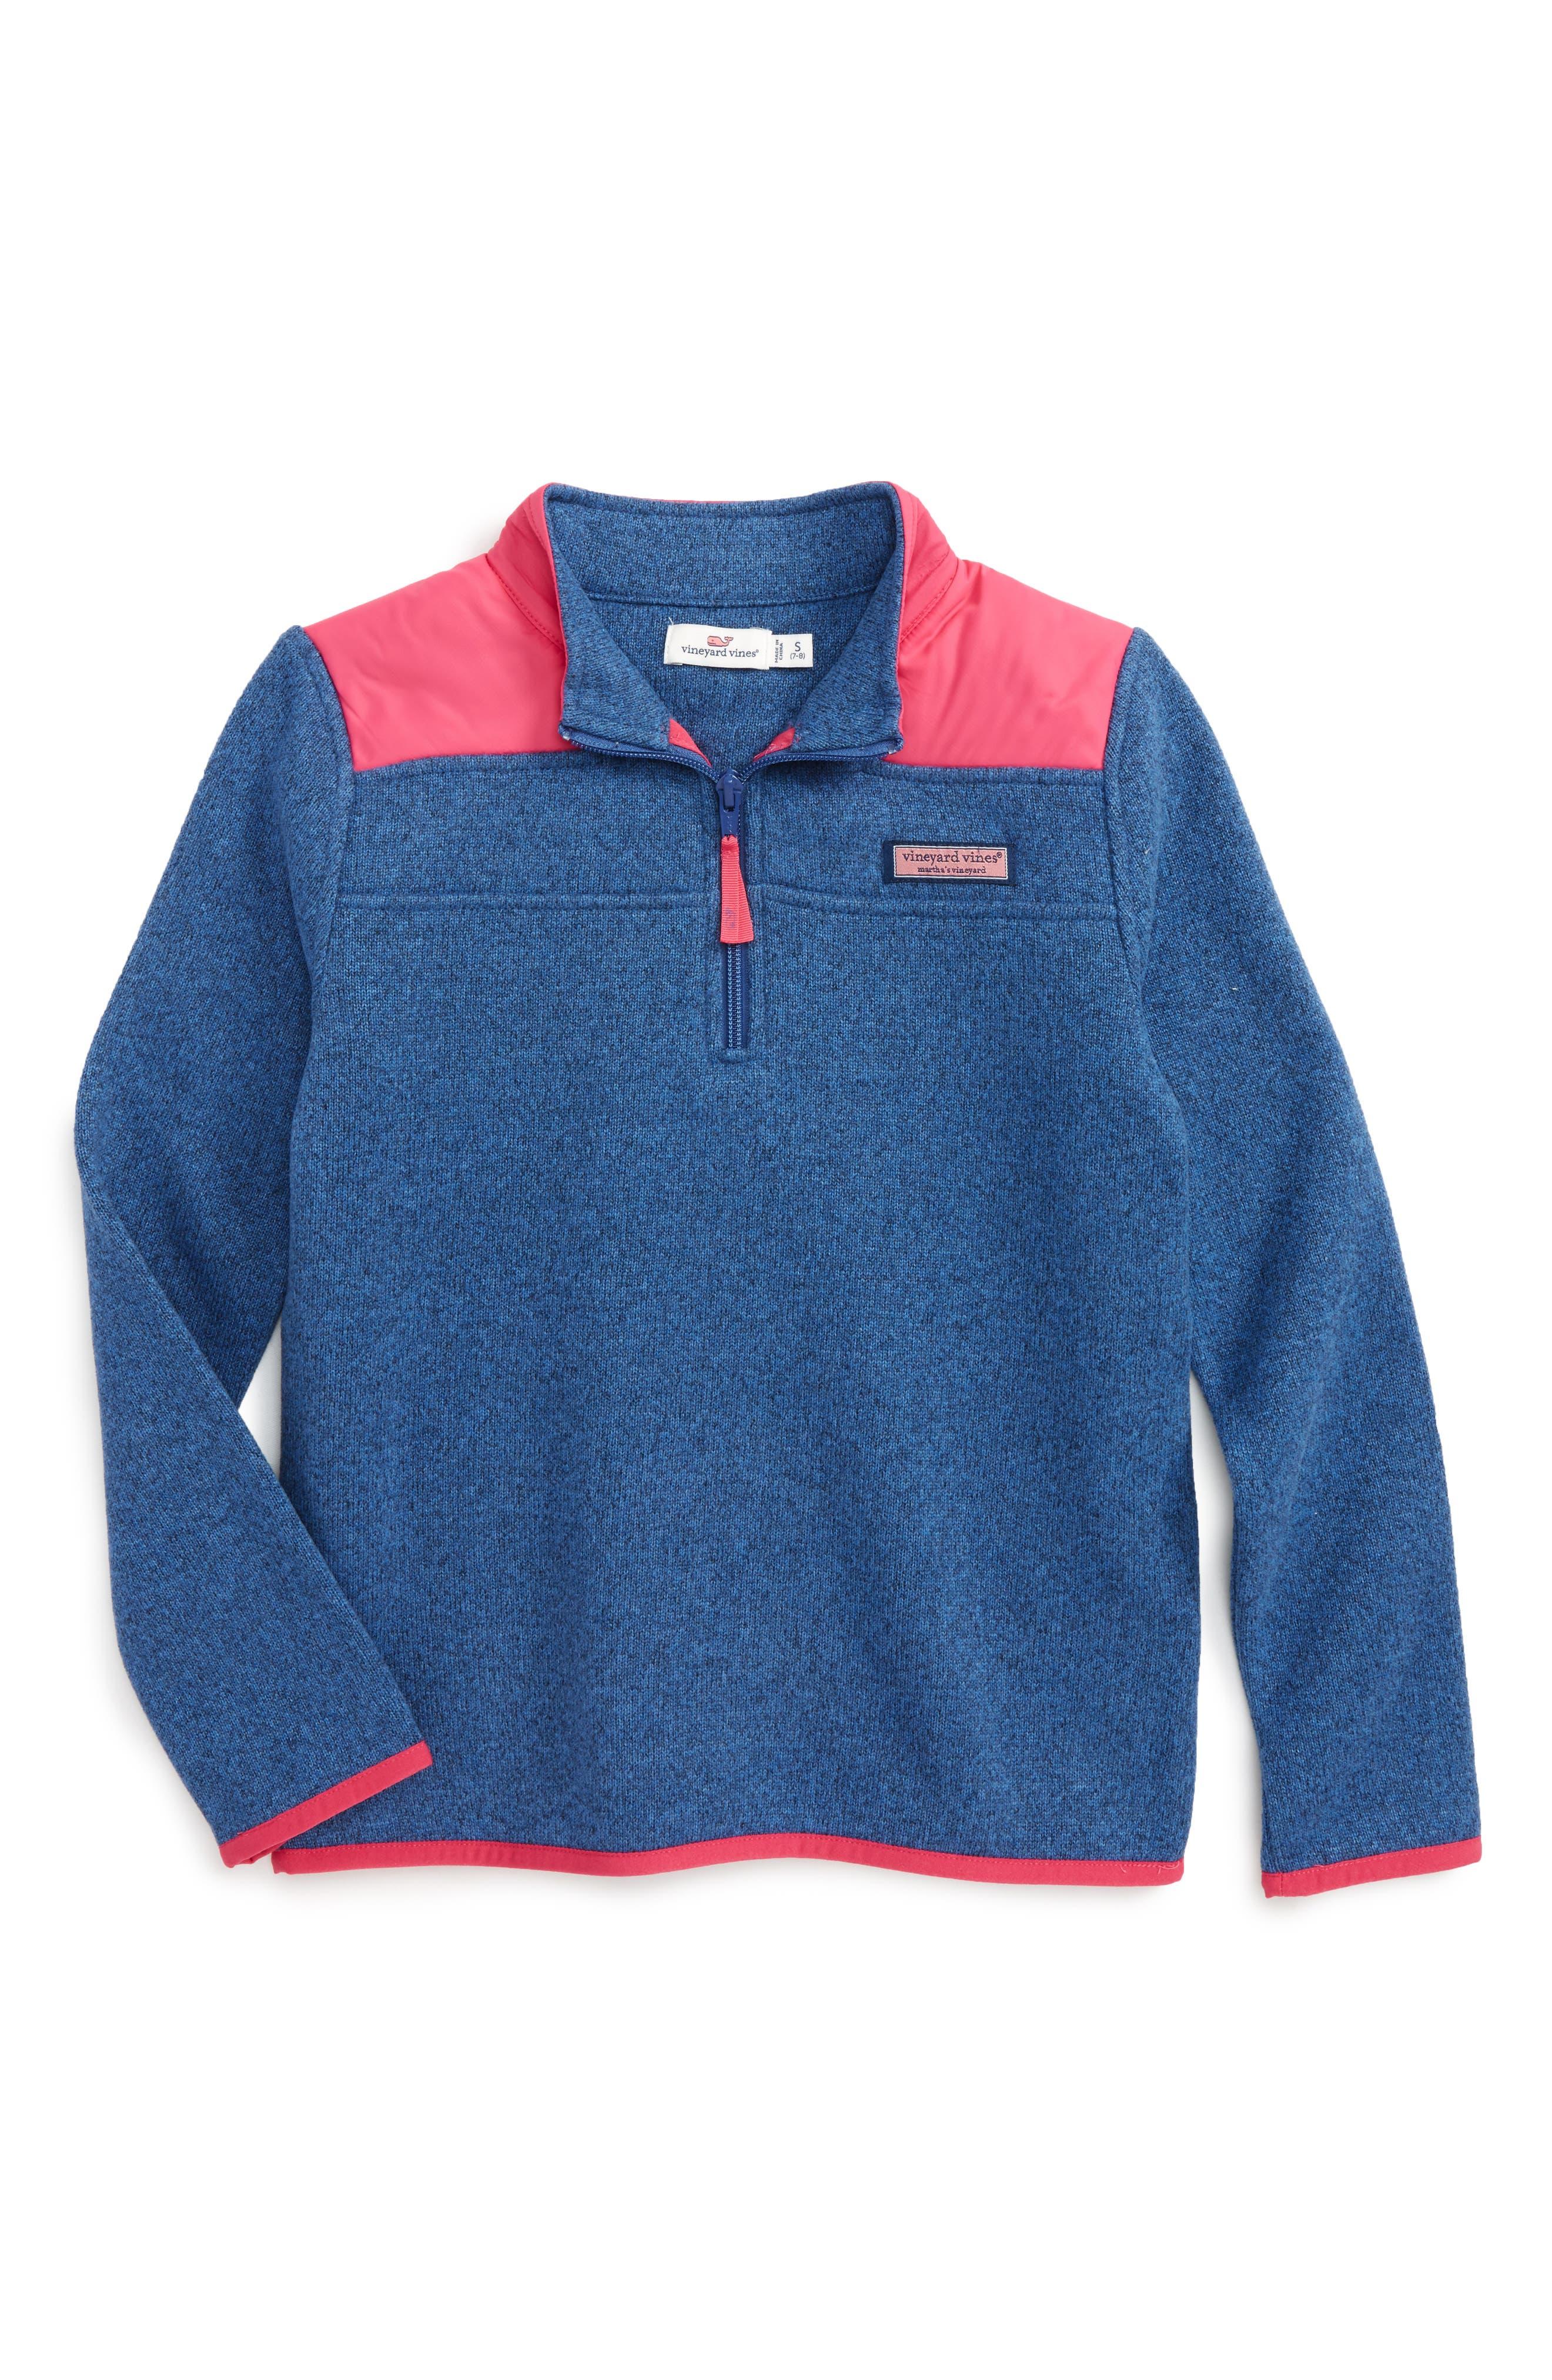 Vineyard Vines Shep Sweater Fleece Pullover (Toddler Girls, Little Girls & Big Girls)